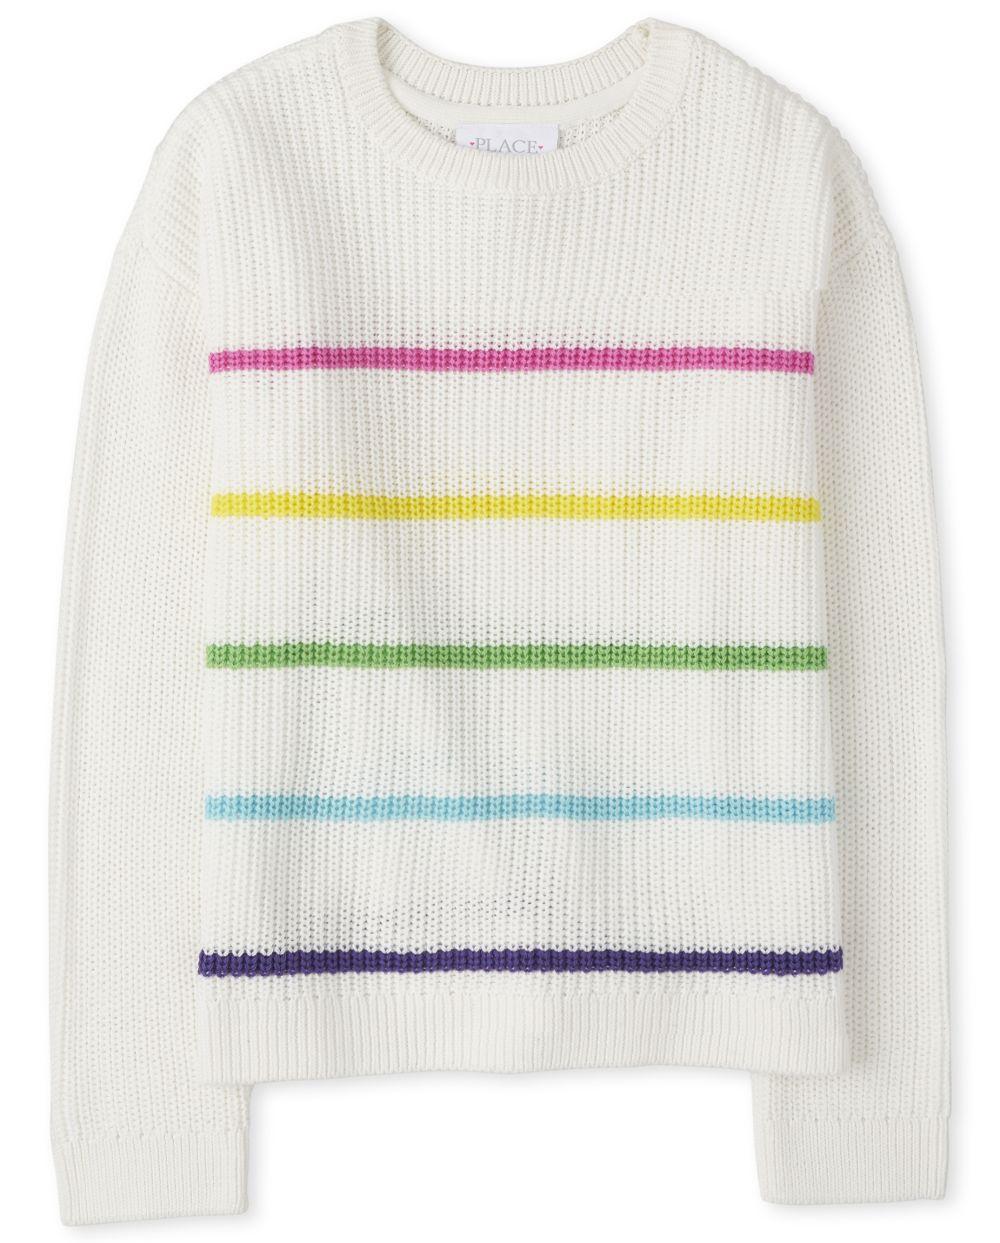 Girls Rainbow Striped Sweaters - White